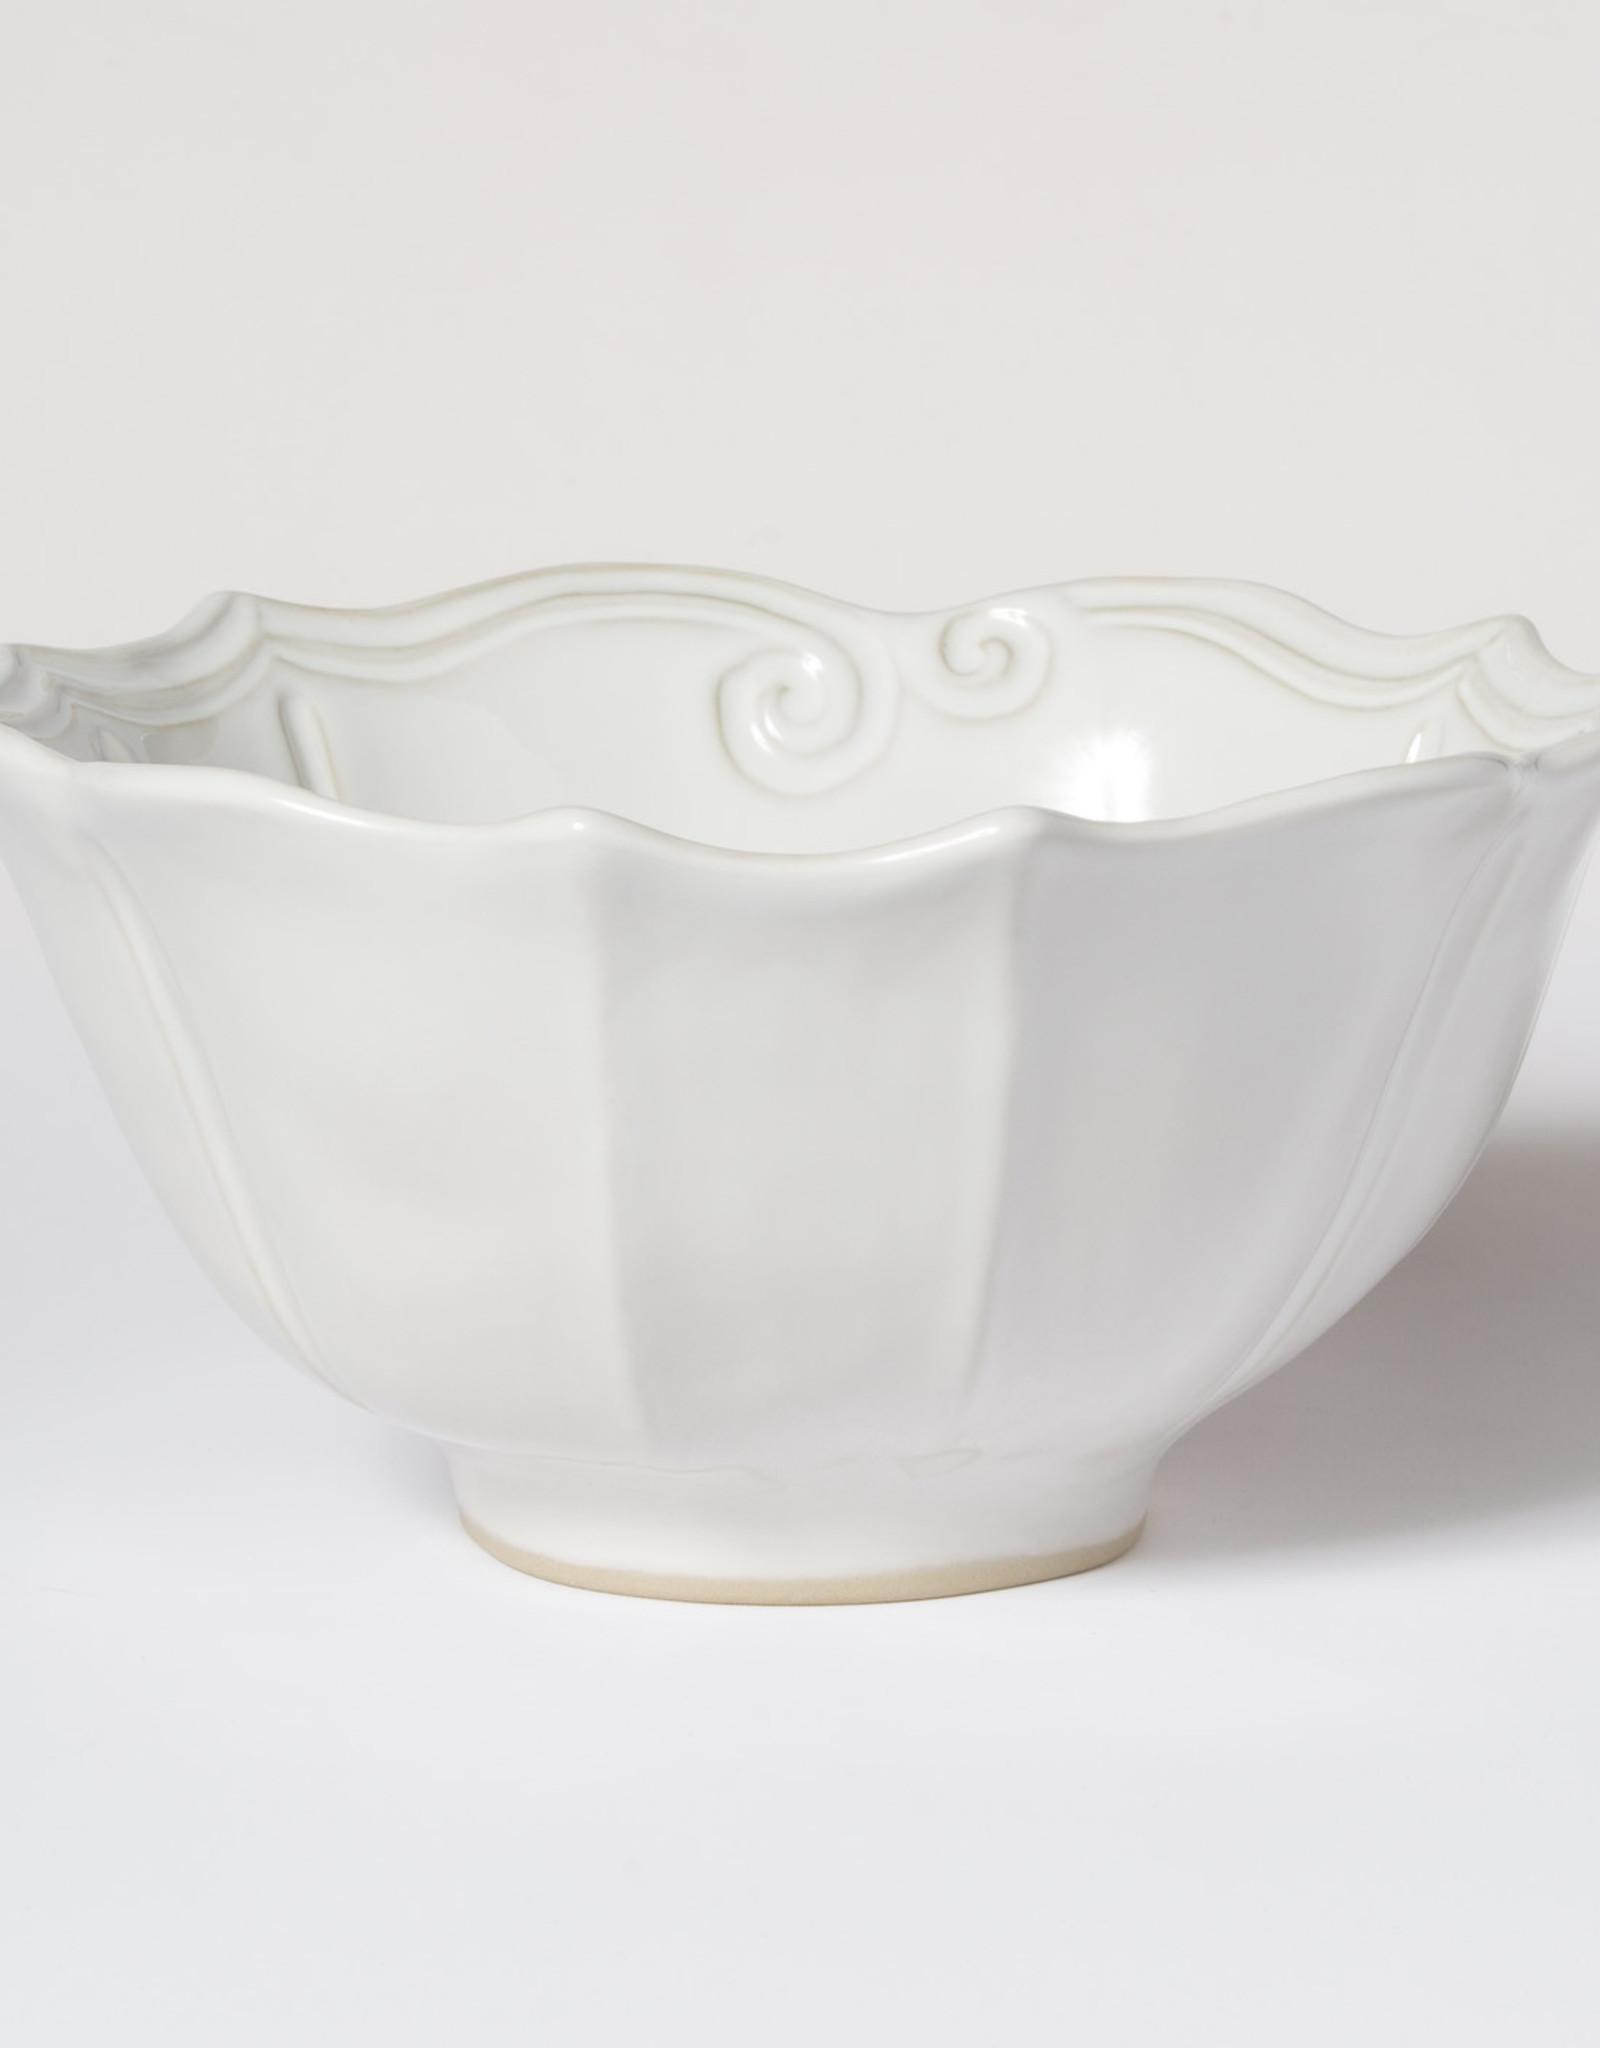 Vietri Incanto Stoneware White Baroque Medium Serving Bowl